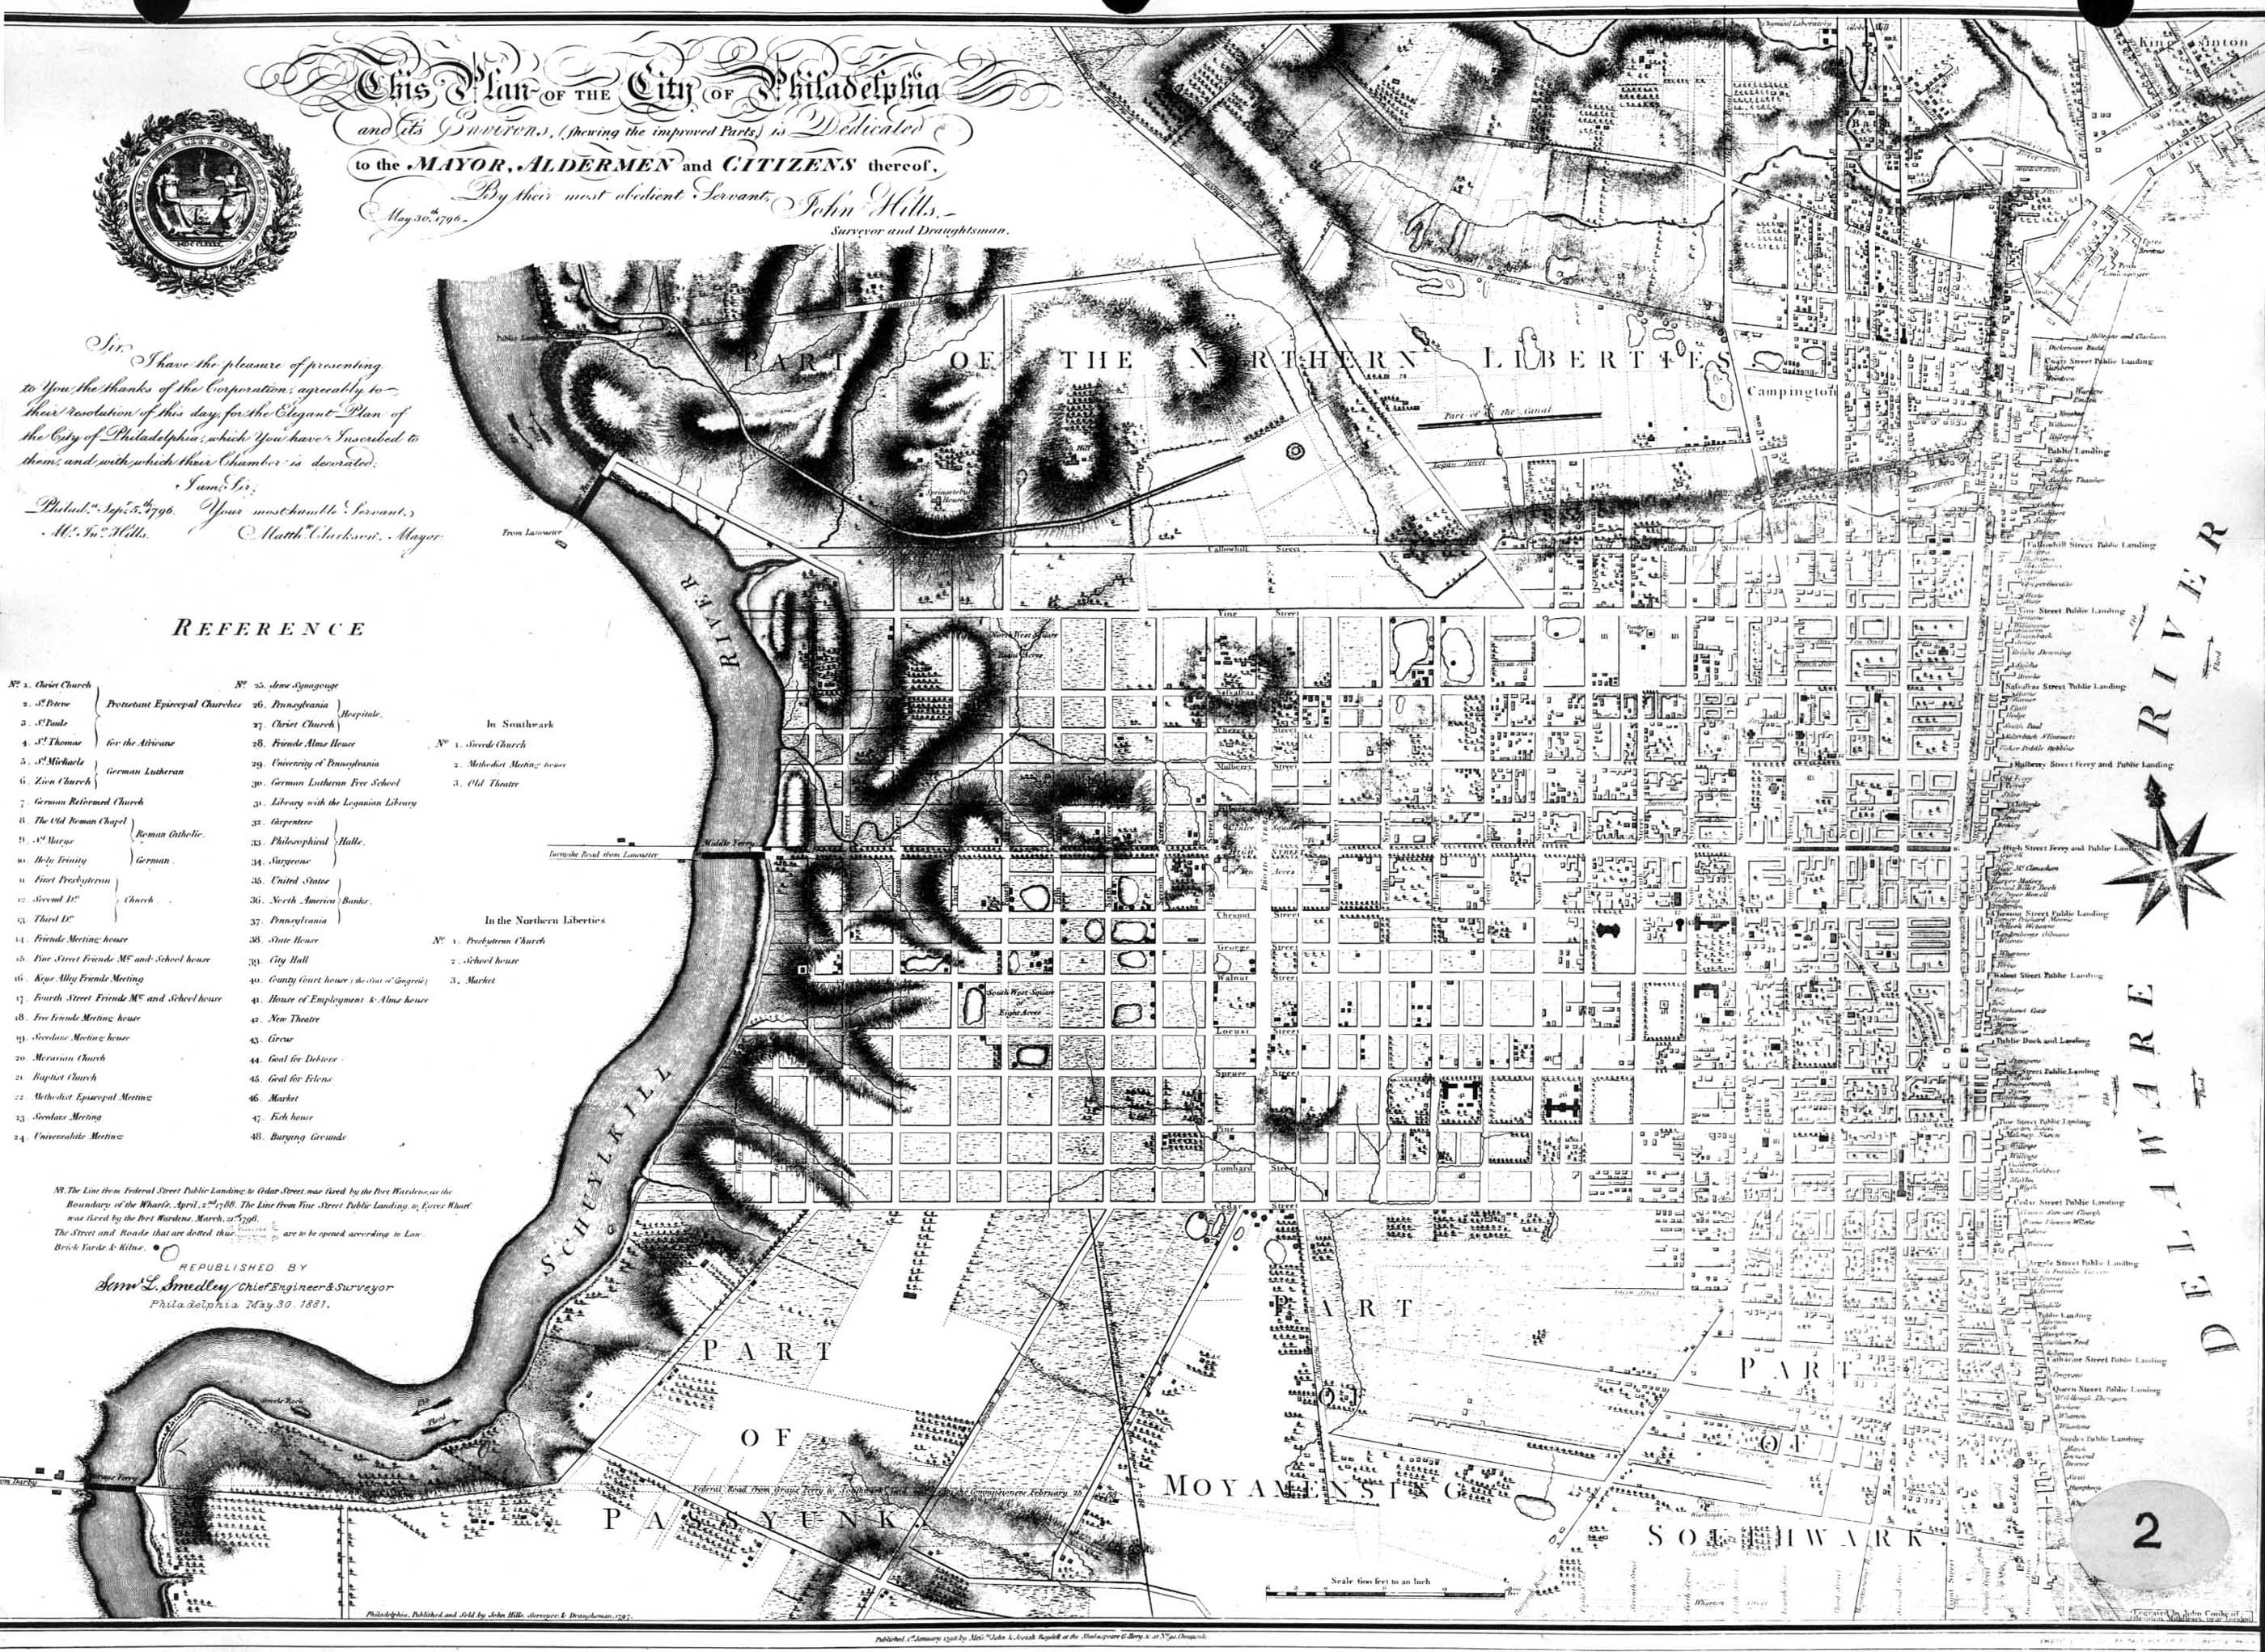 1786 map of Philadelphia